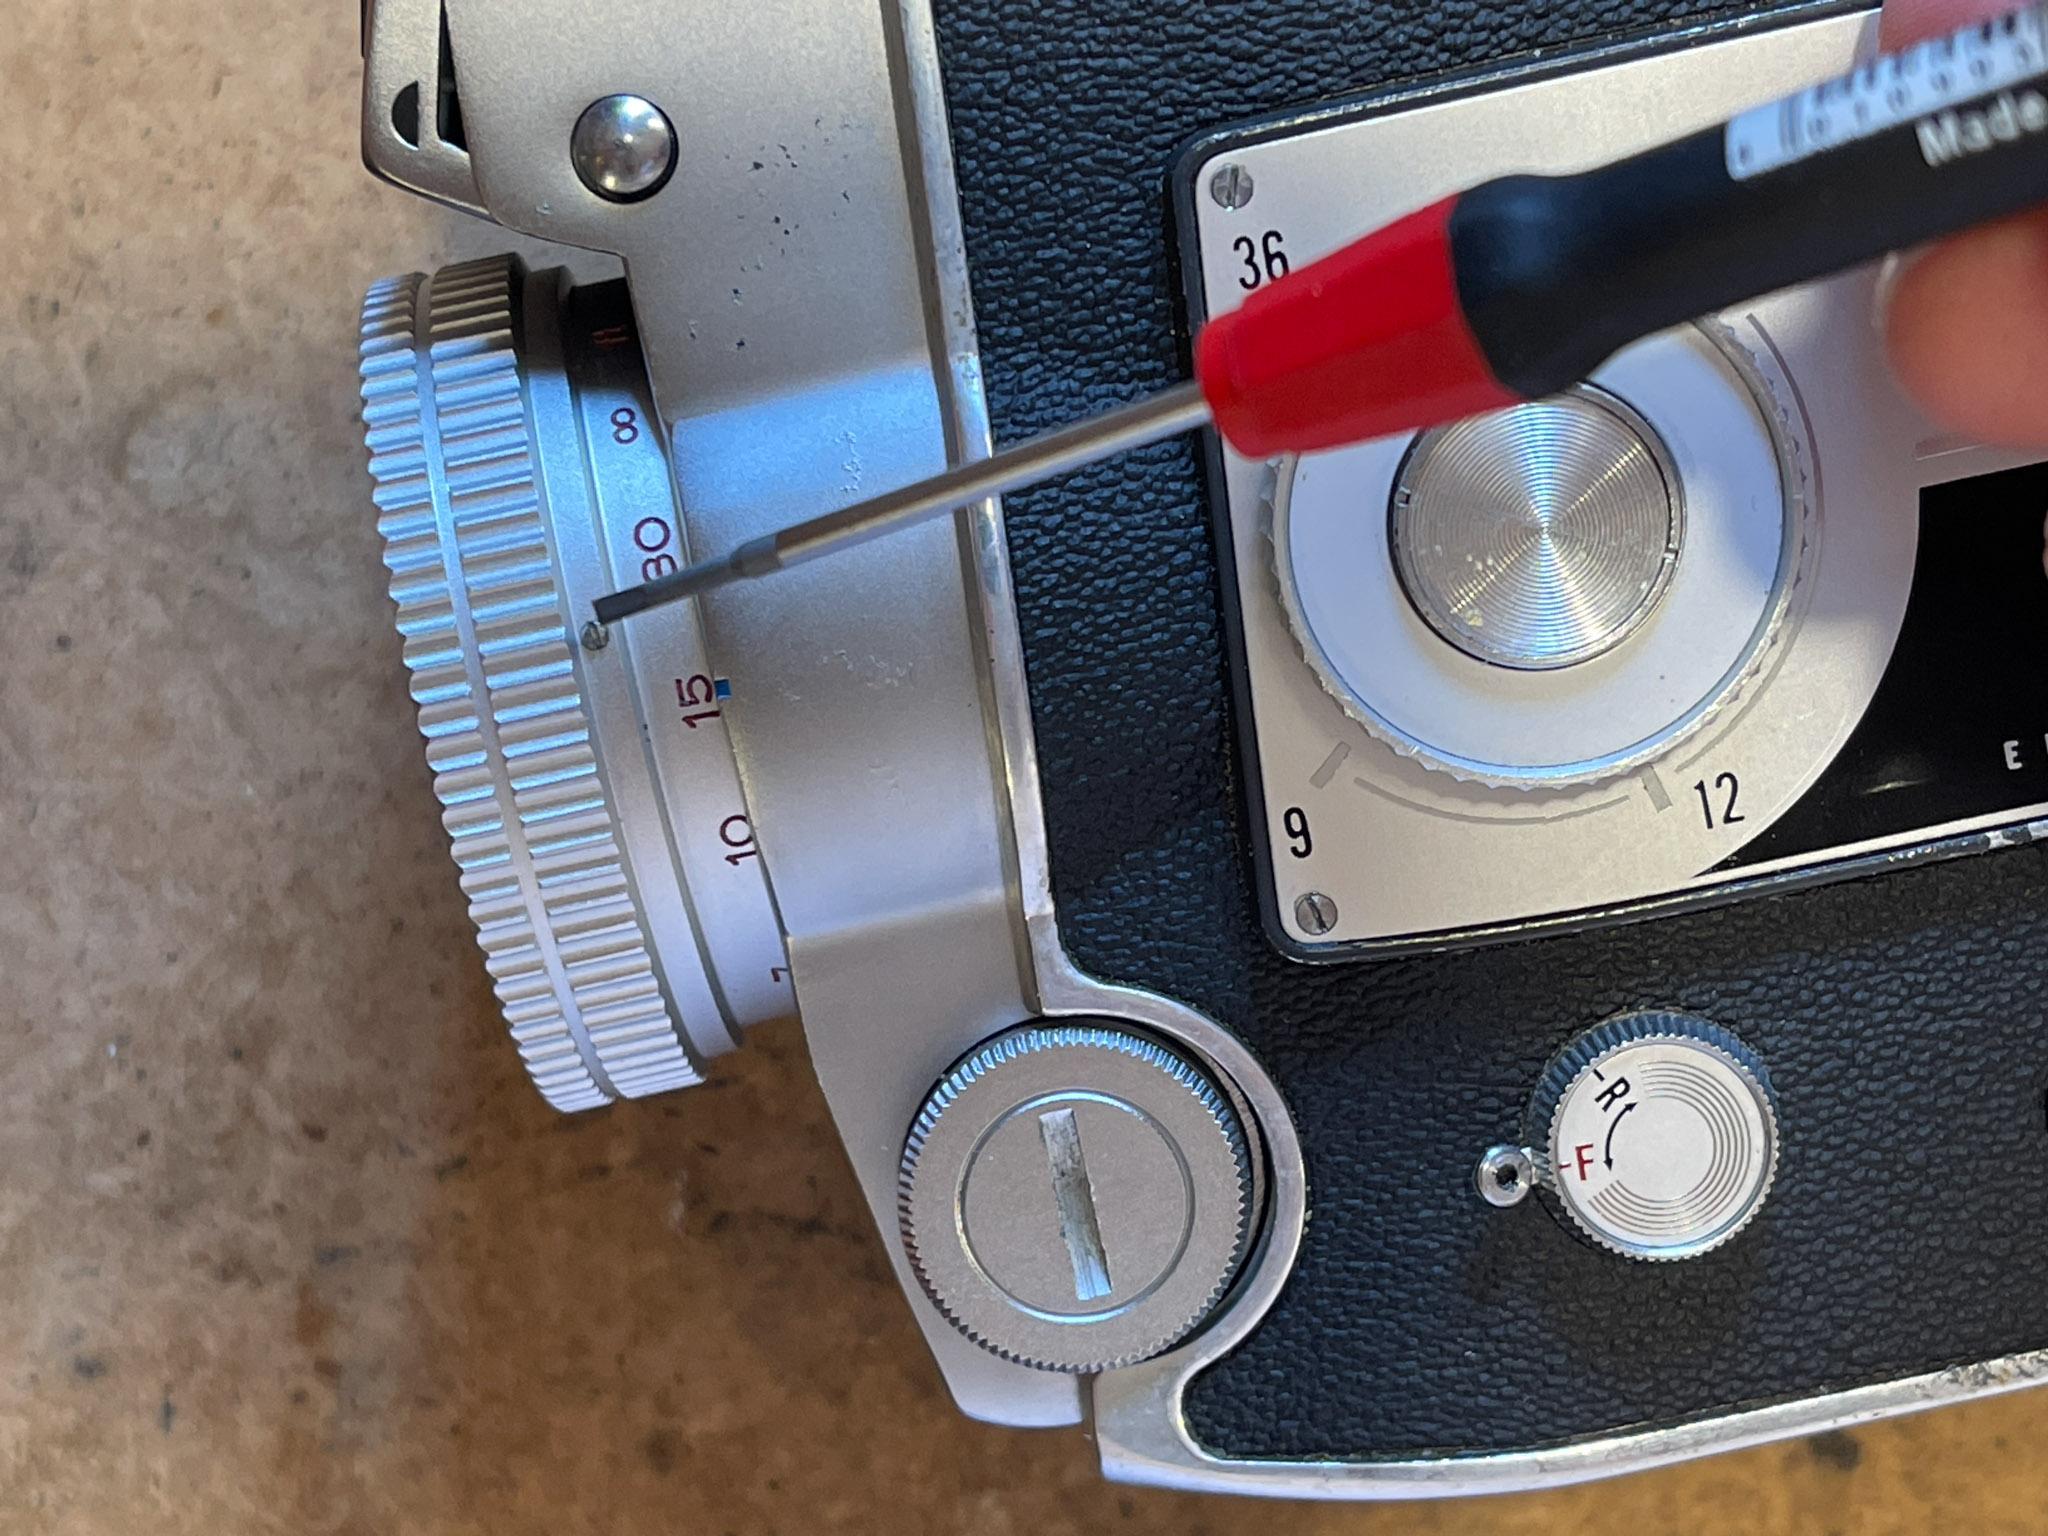 Elmo C-300 Reparatur Belichtungsmesser